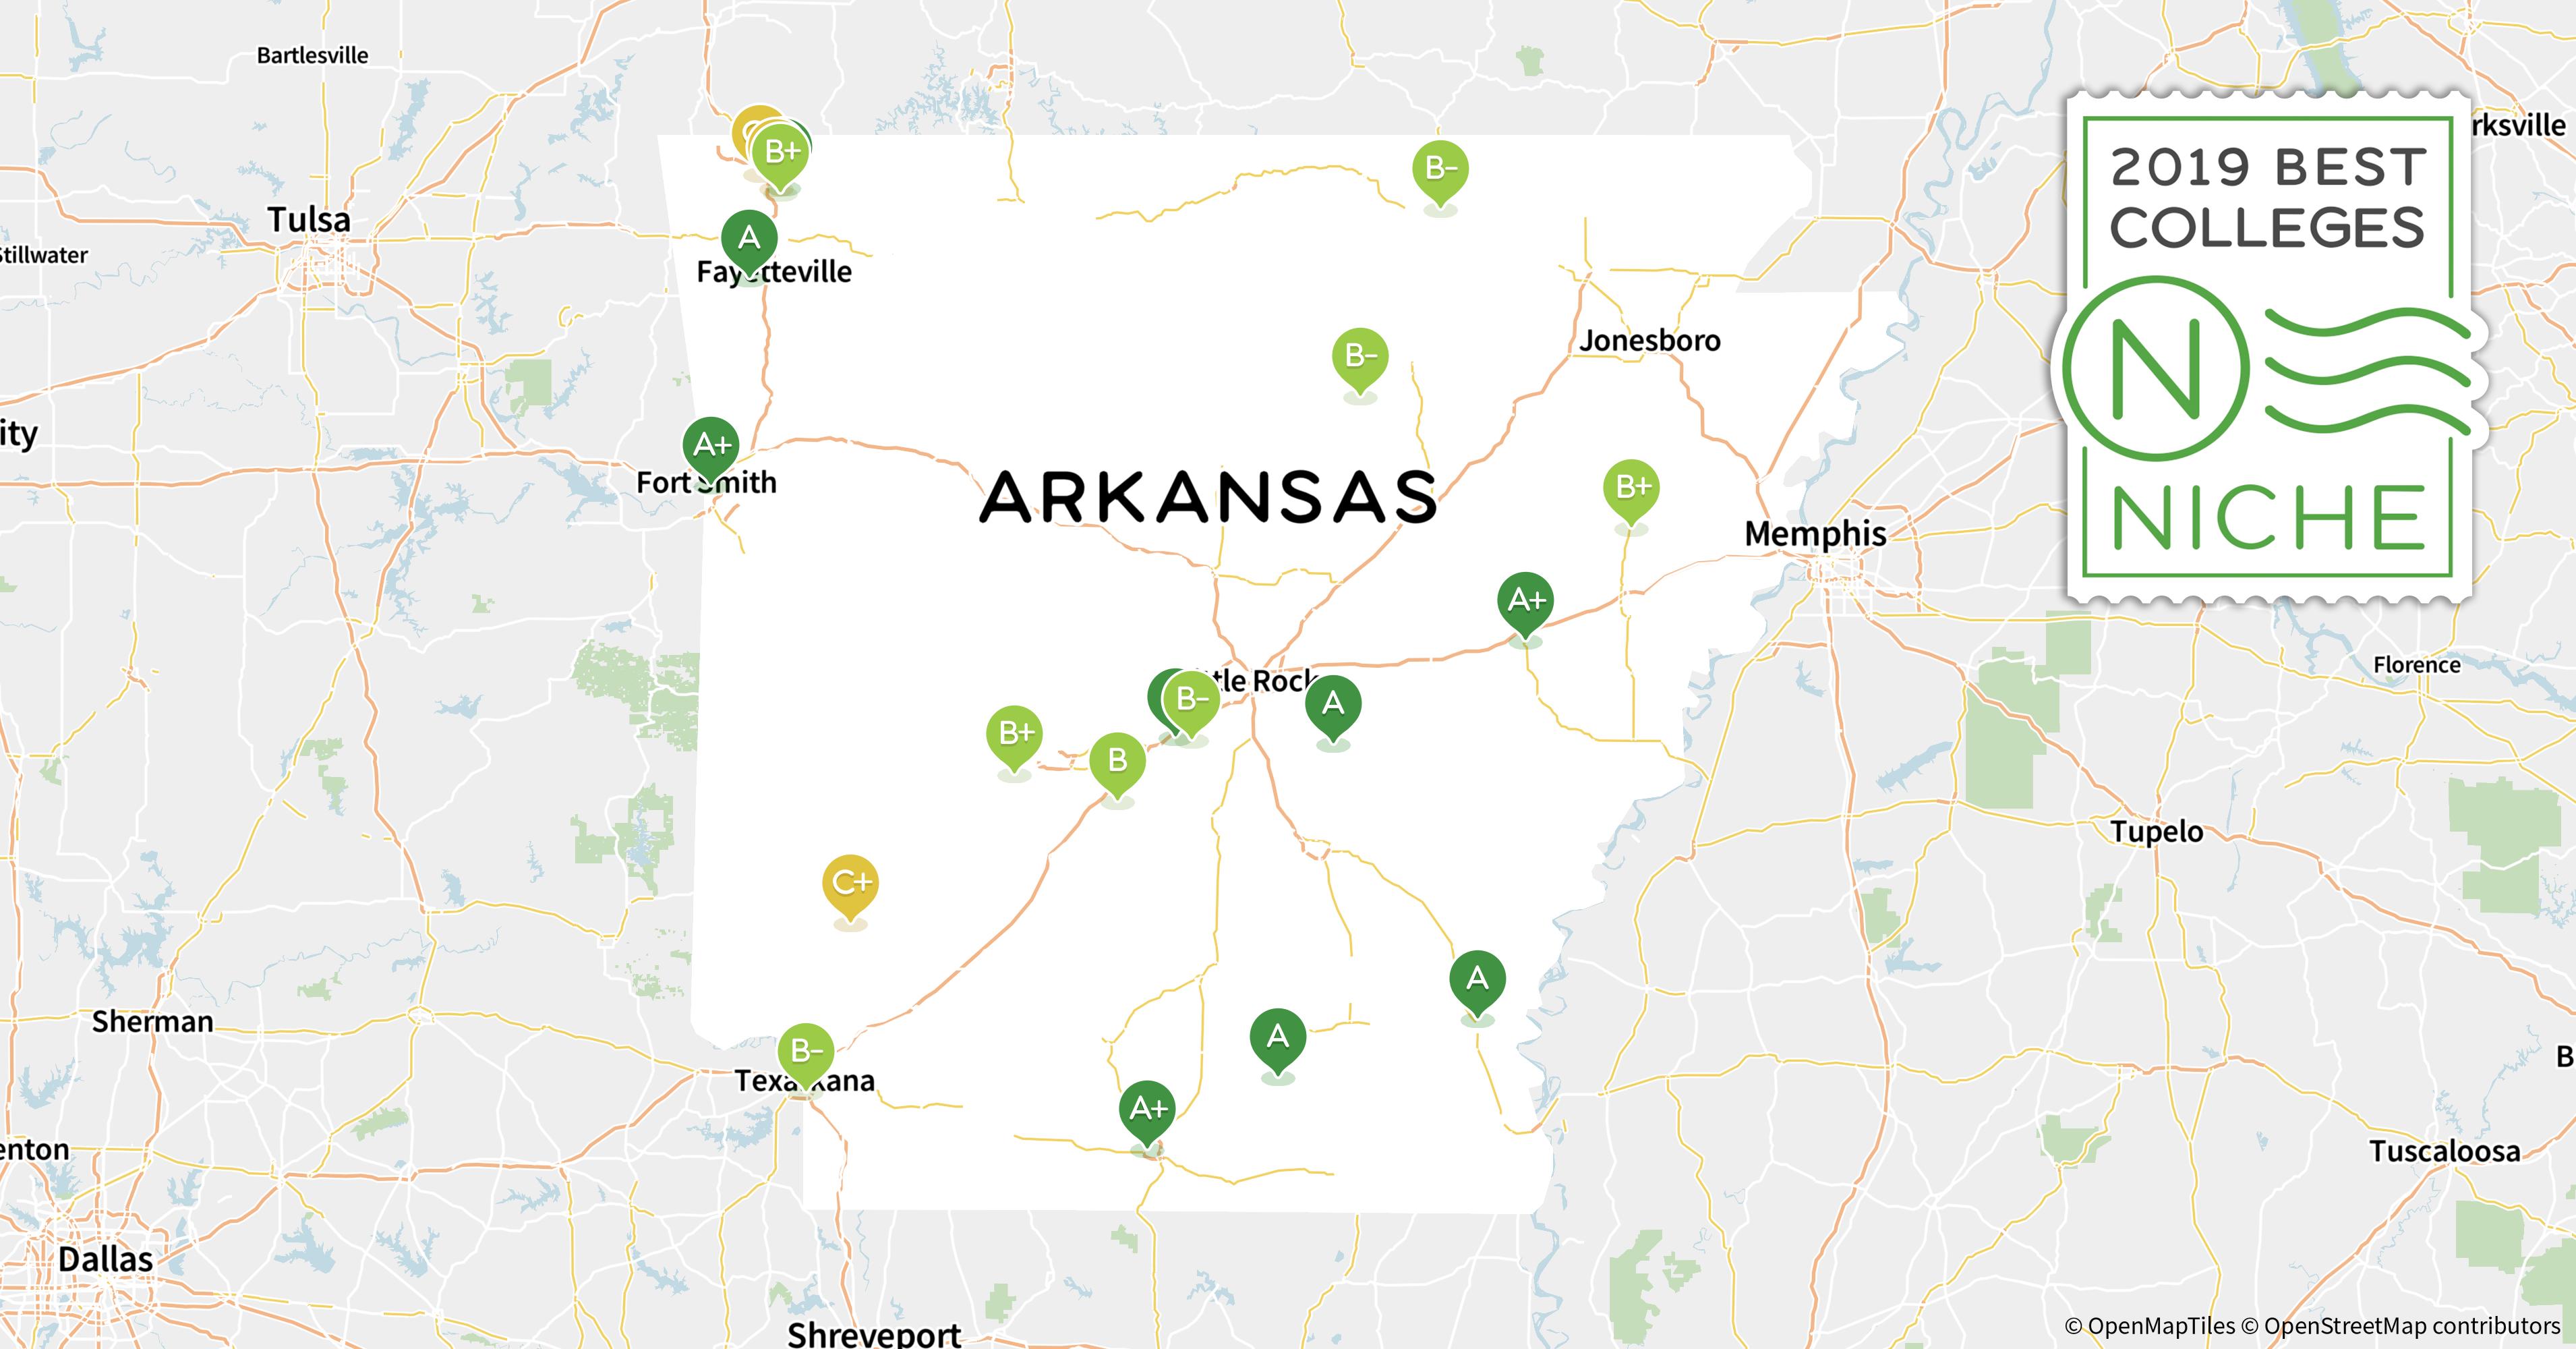 Asu Jonesboro Campus Map.2019 Best Colleges In Arkansas Niche